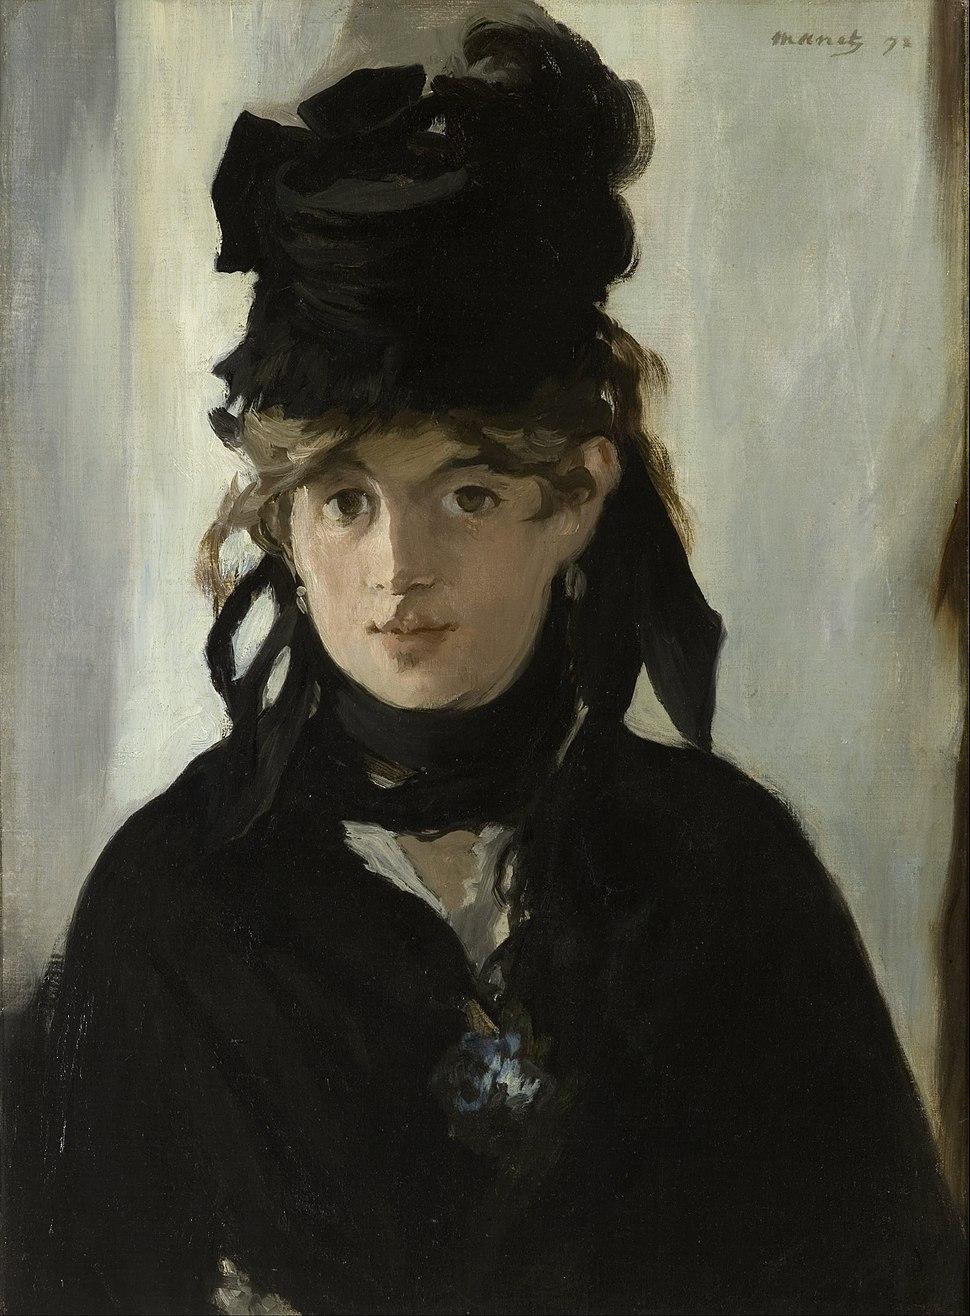 Edouard Manet - Berthe Morisot With a Bouquet of Violets - Google Art Project